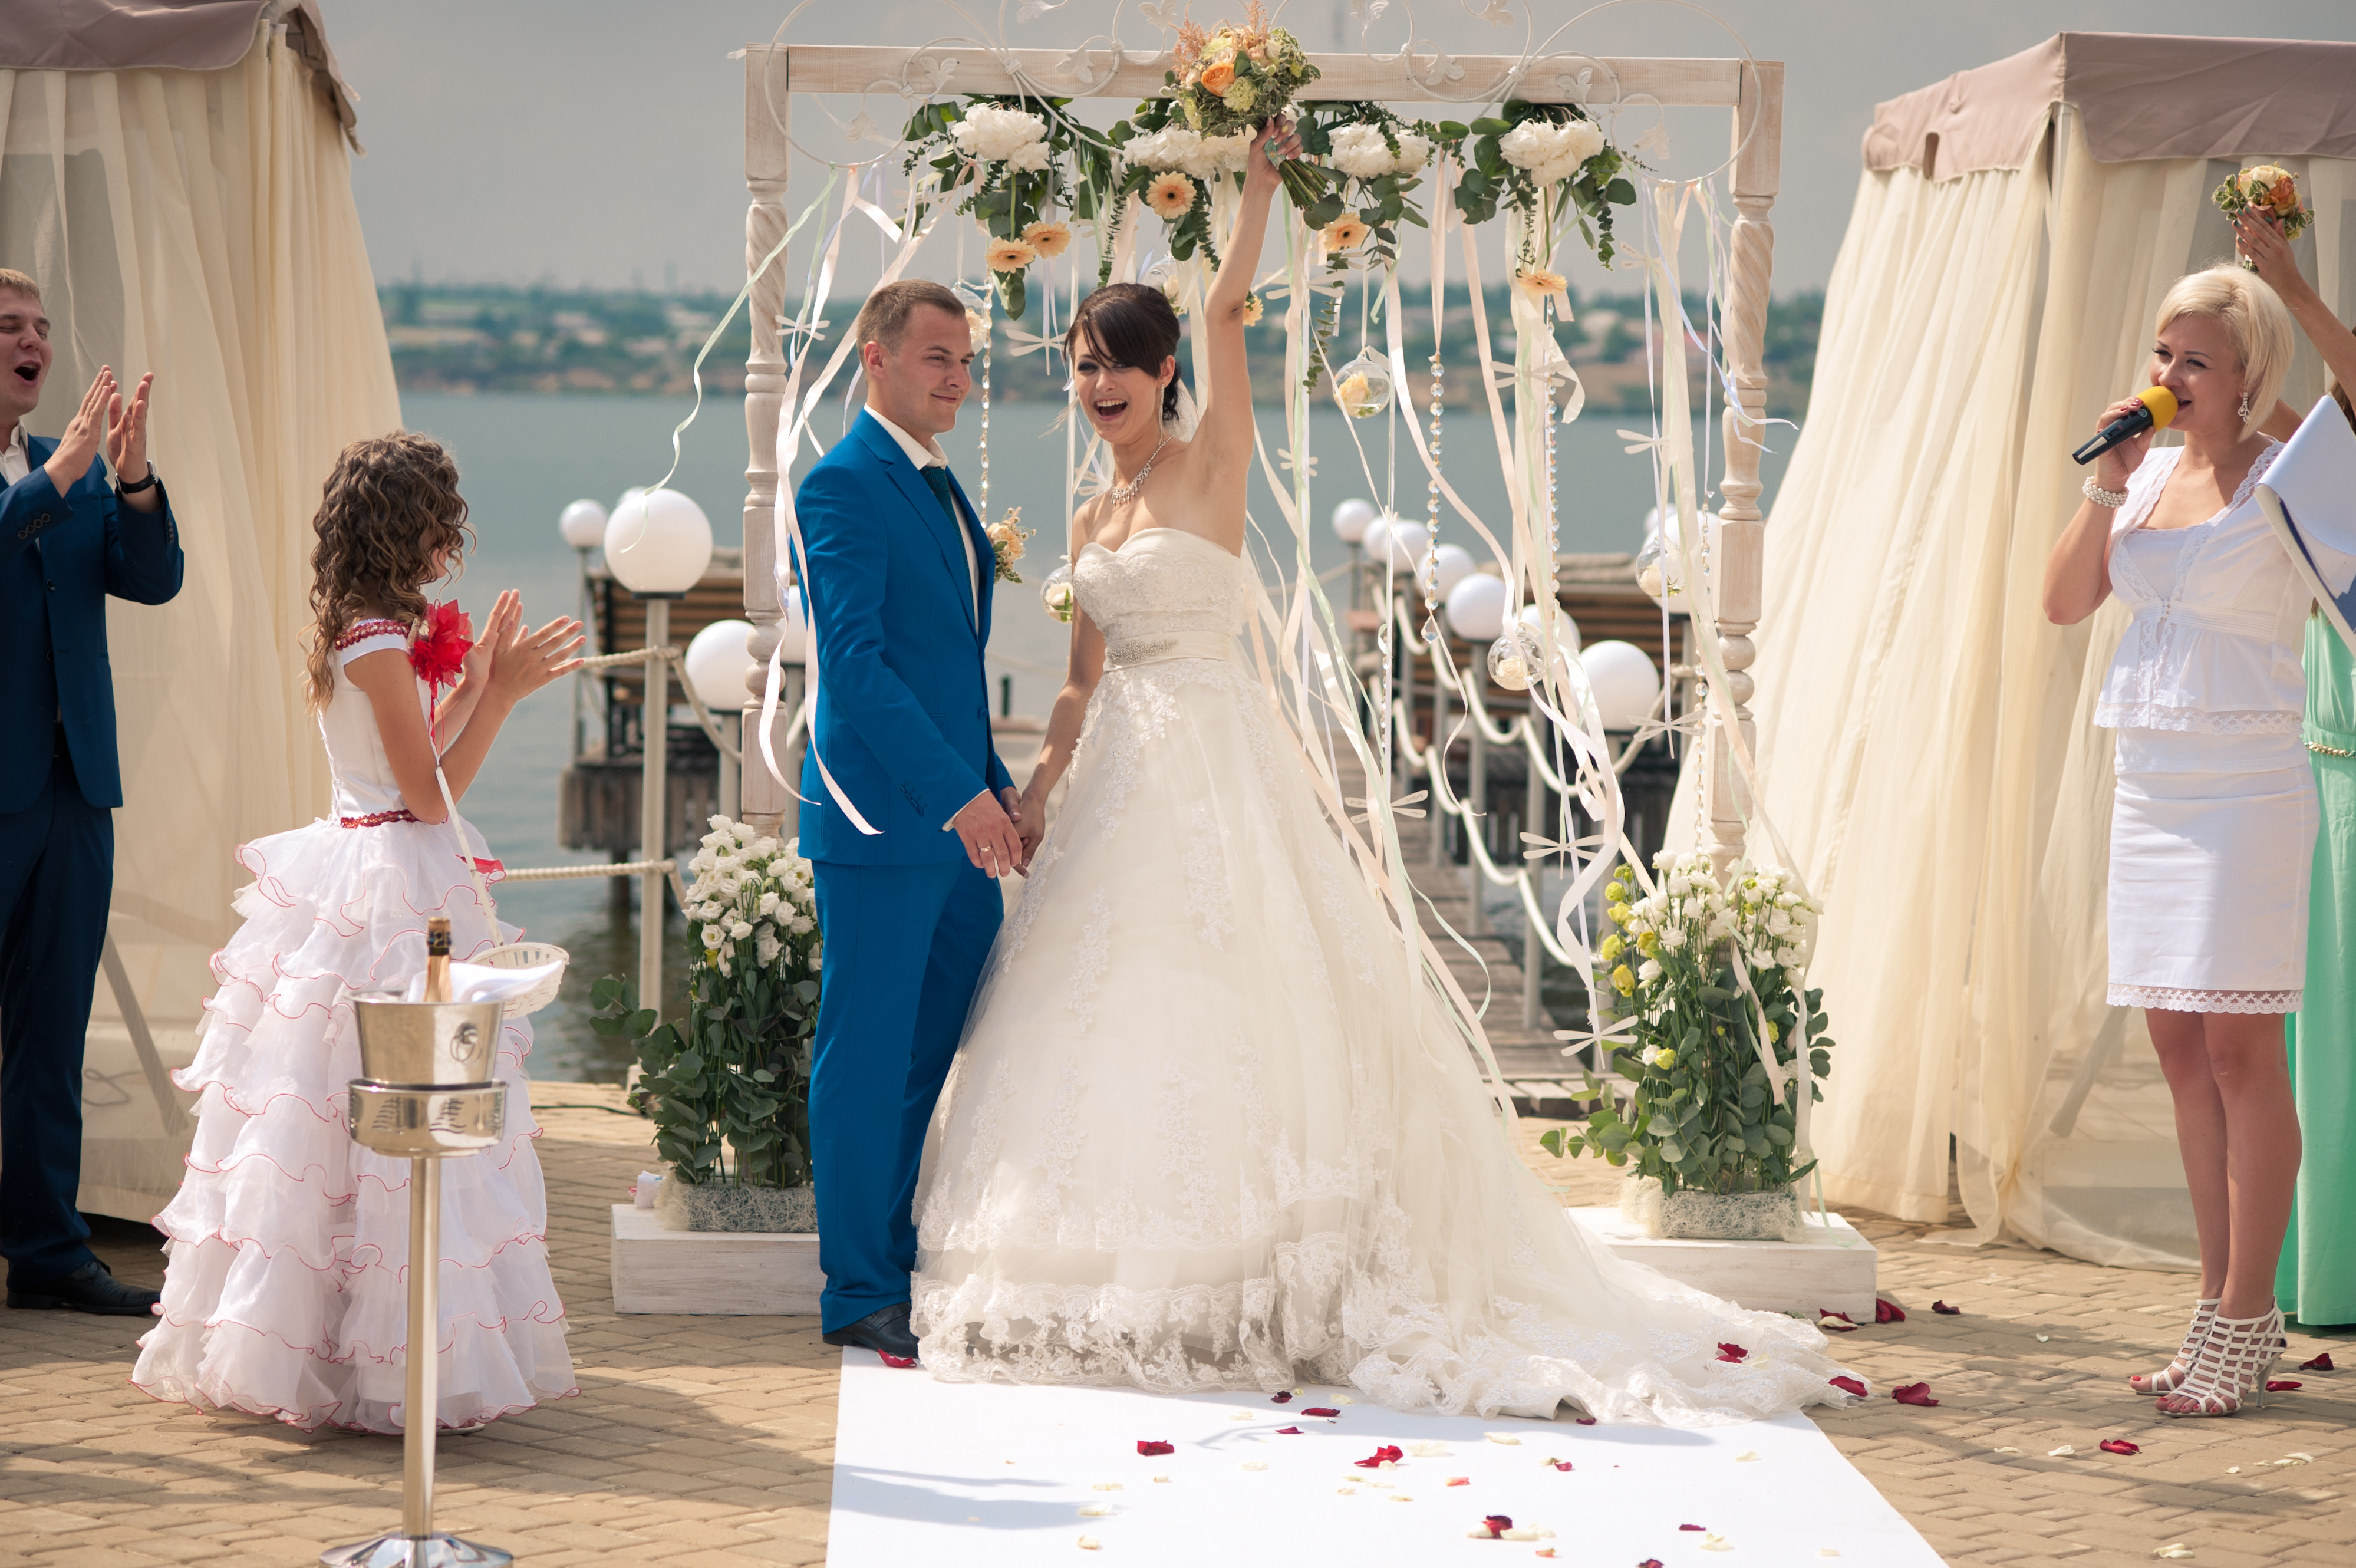 Фото свадеб г николаев